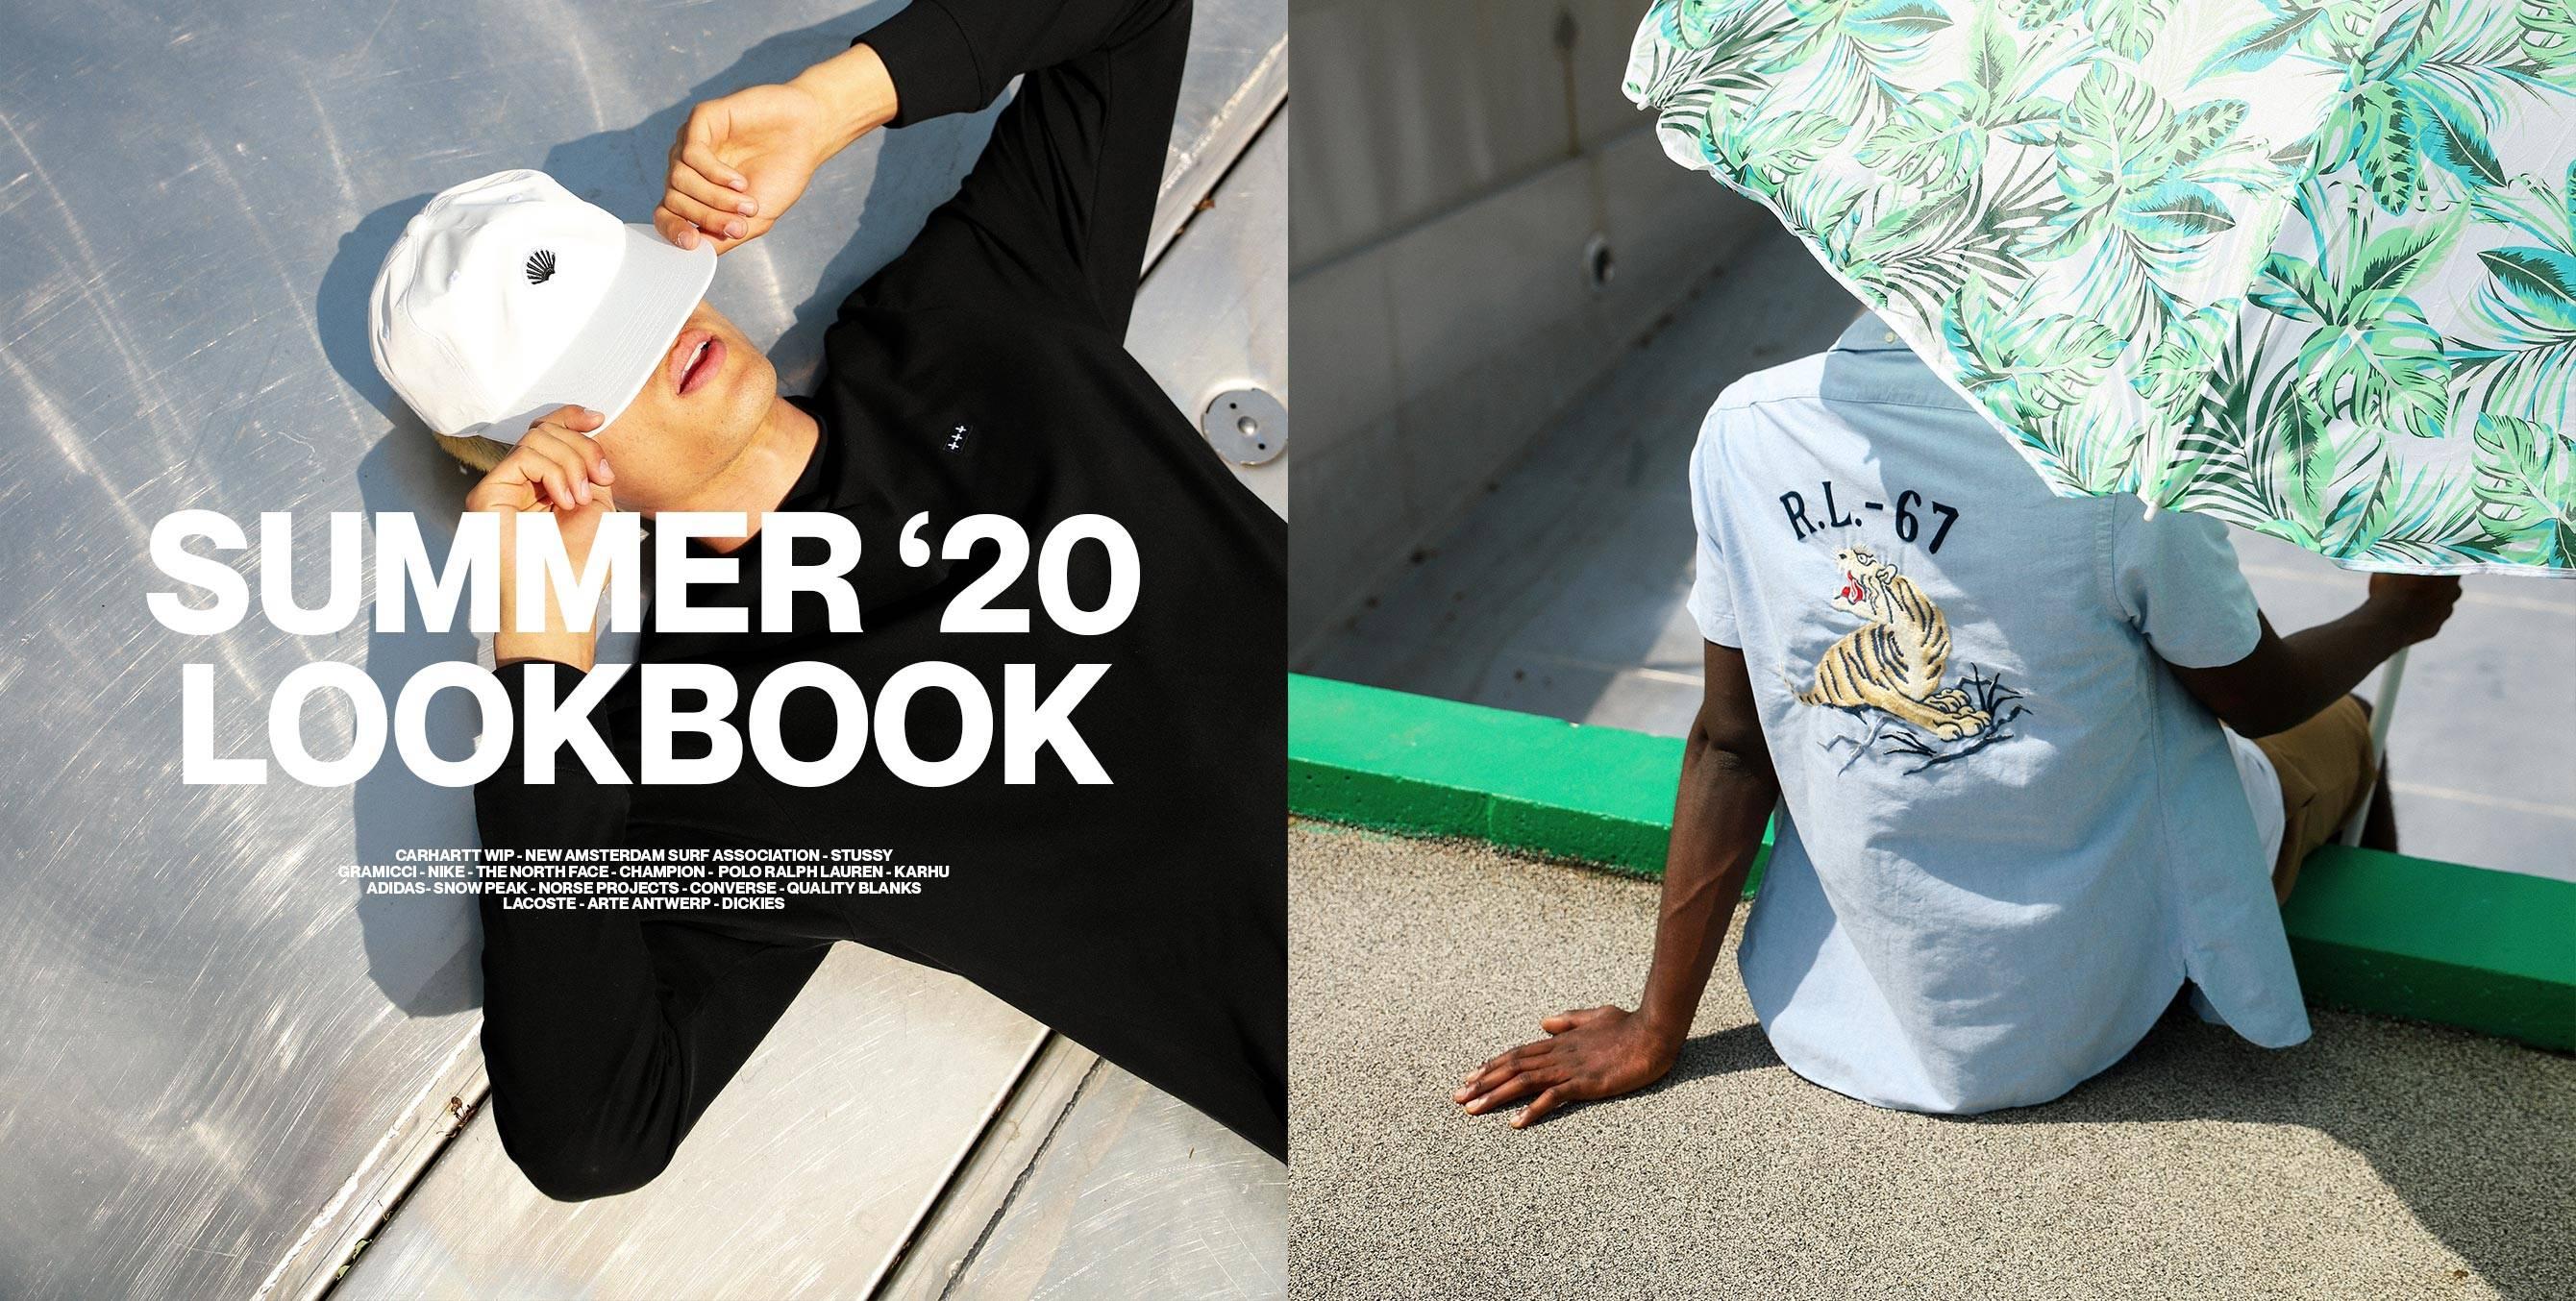 Summer '20 Lookbook